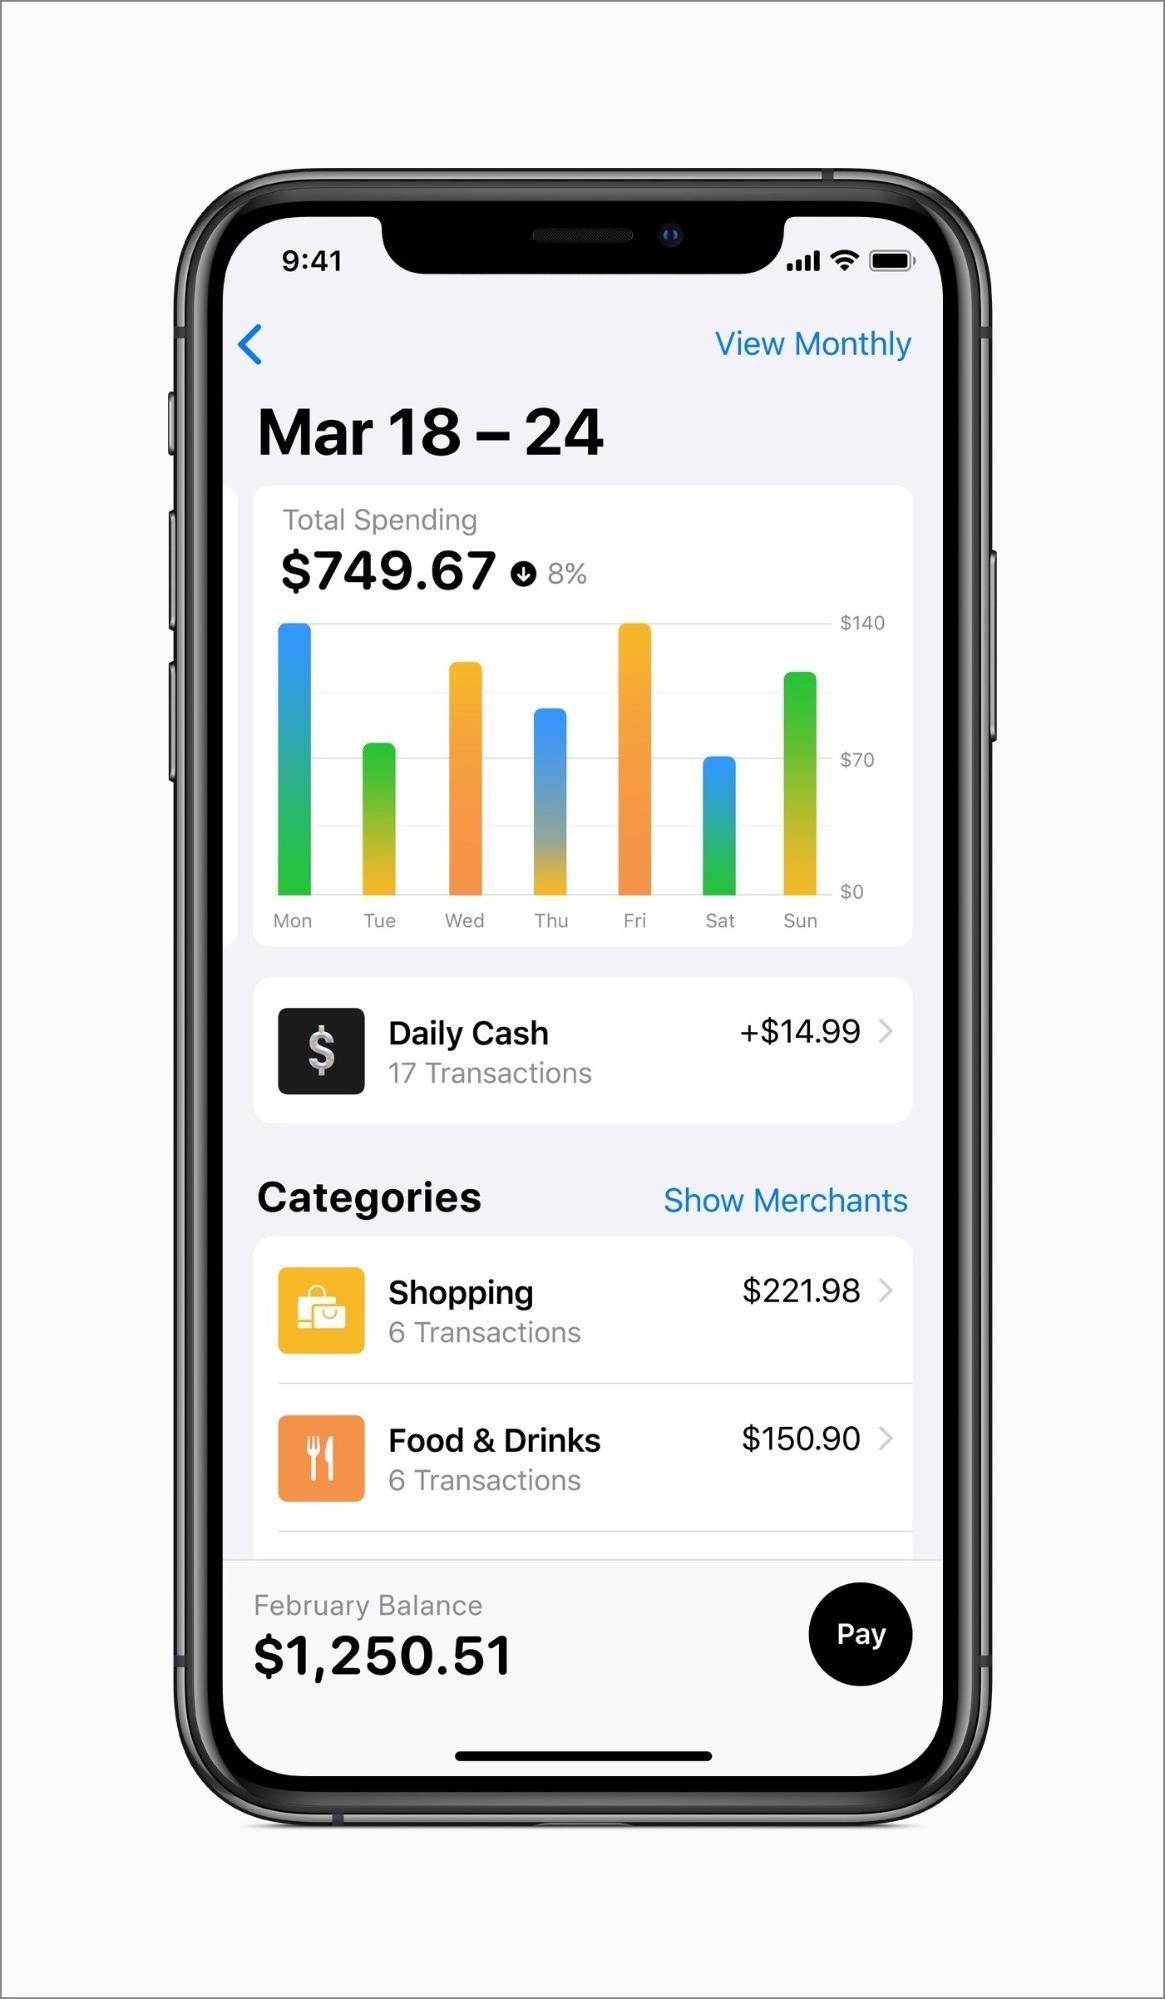 Apple-Card-2 screen shot.jpg